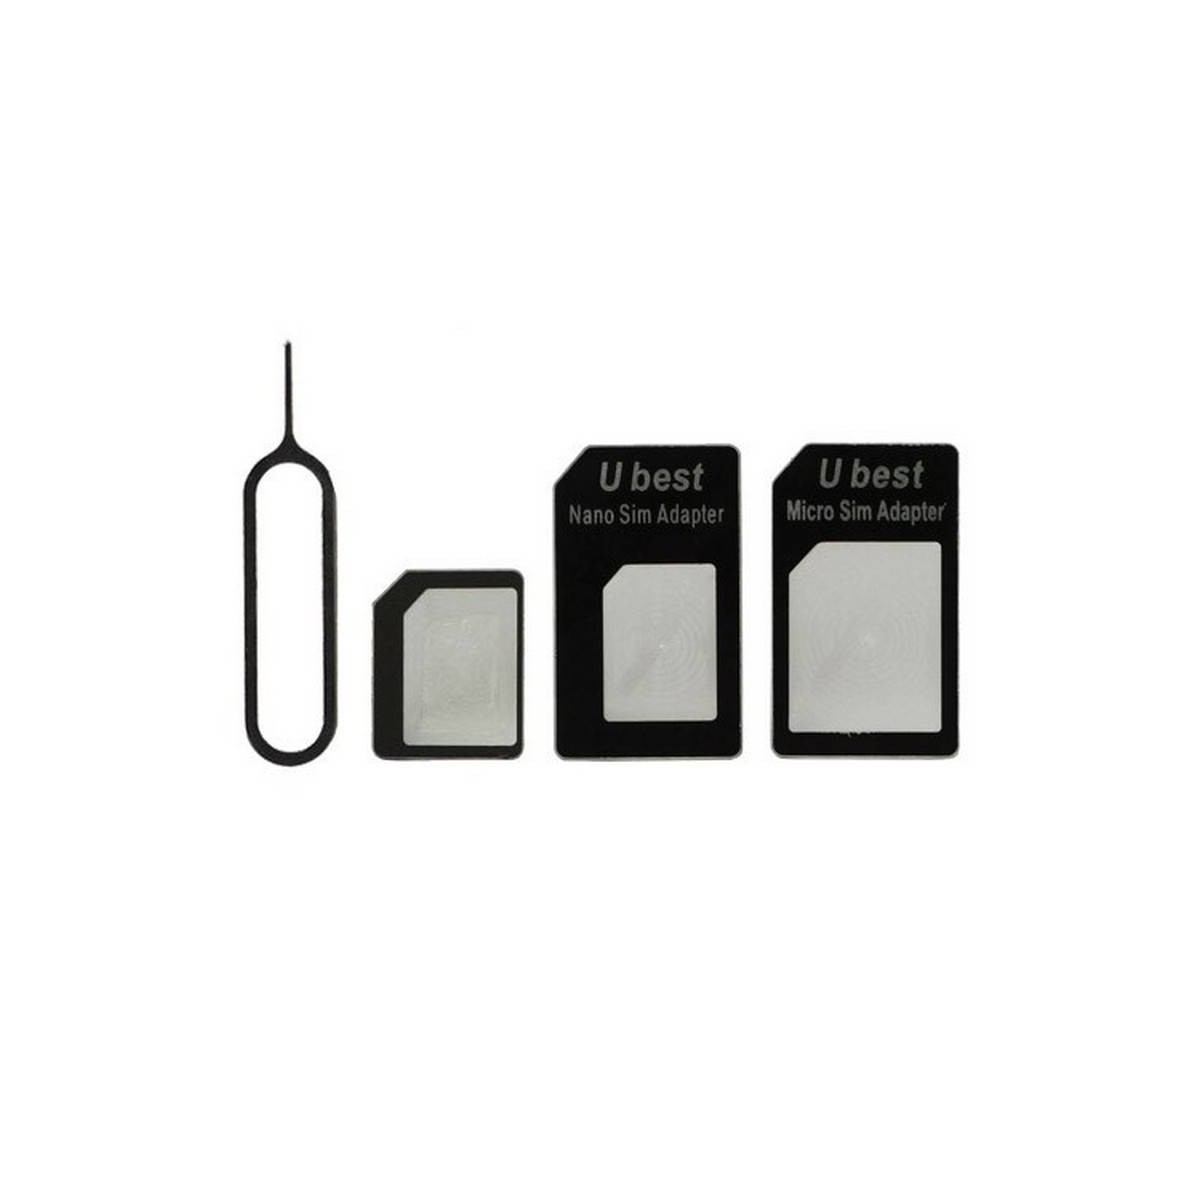 NANO A MICRO/NORMAL SIM TARJETA ADAPTADOR PARA APPLE IPHONE 5 4S 4G 3GS 3G PRETO